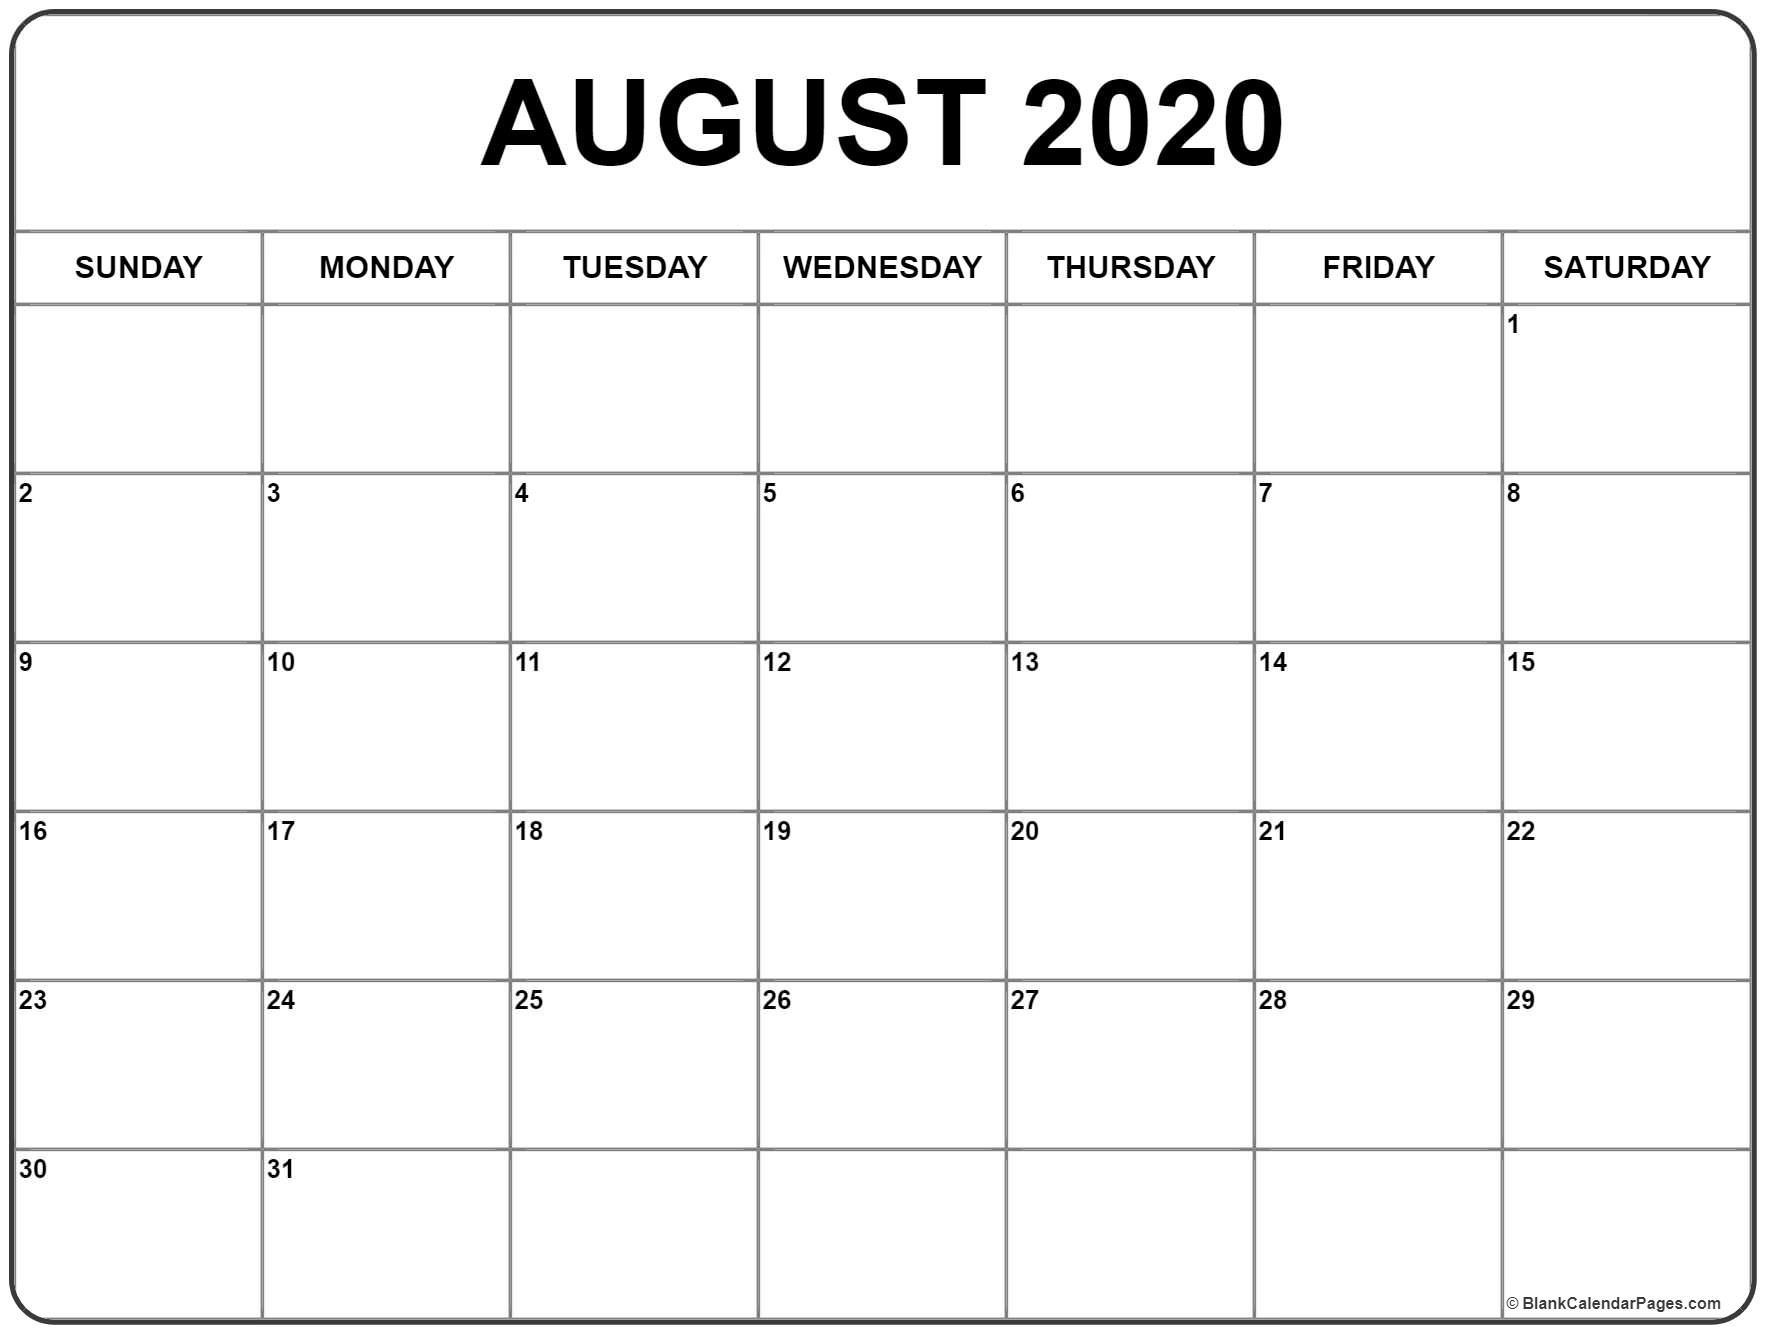 August 2020 Calendar | August Calendar, Monthly Calendar-Monthly Calendar June July August 2020